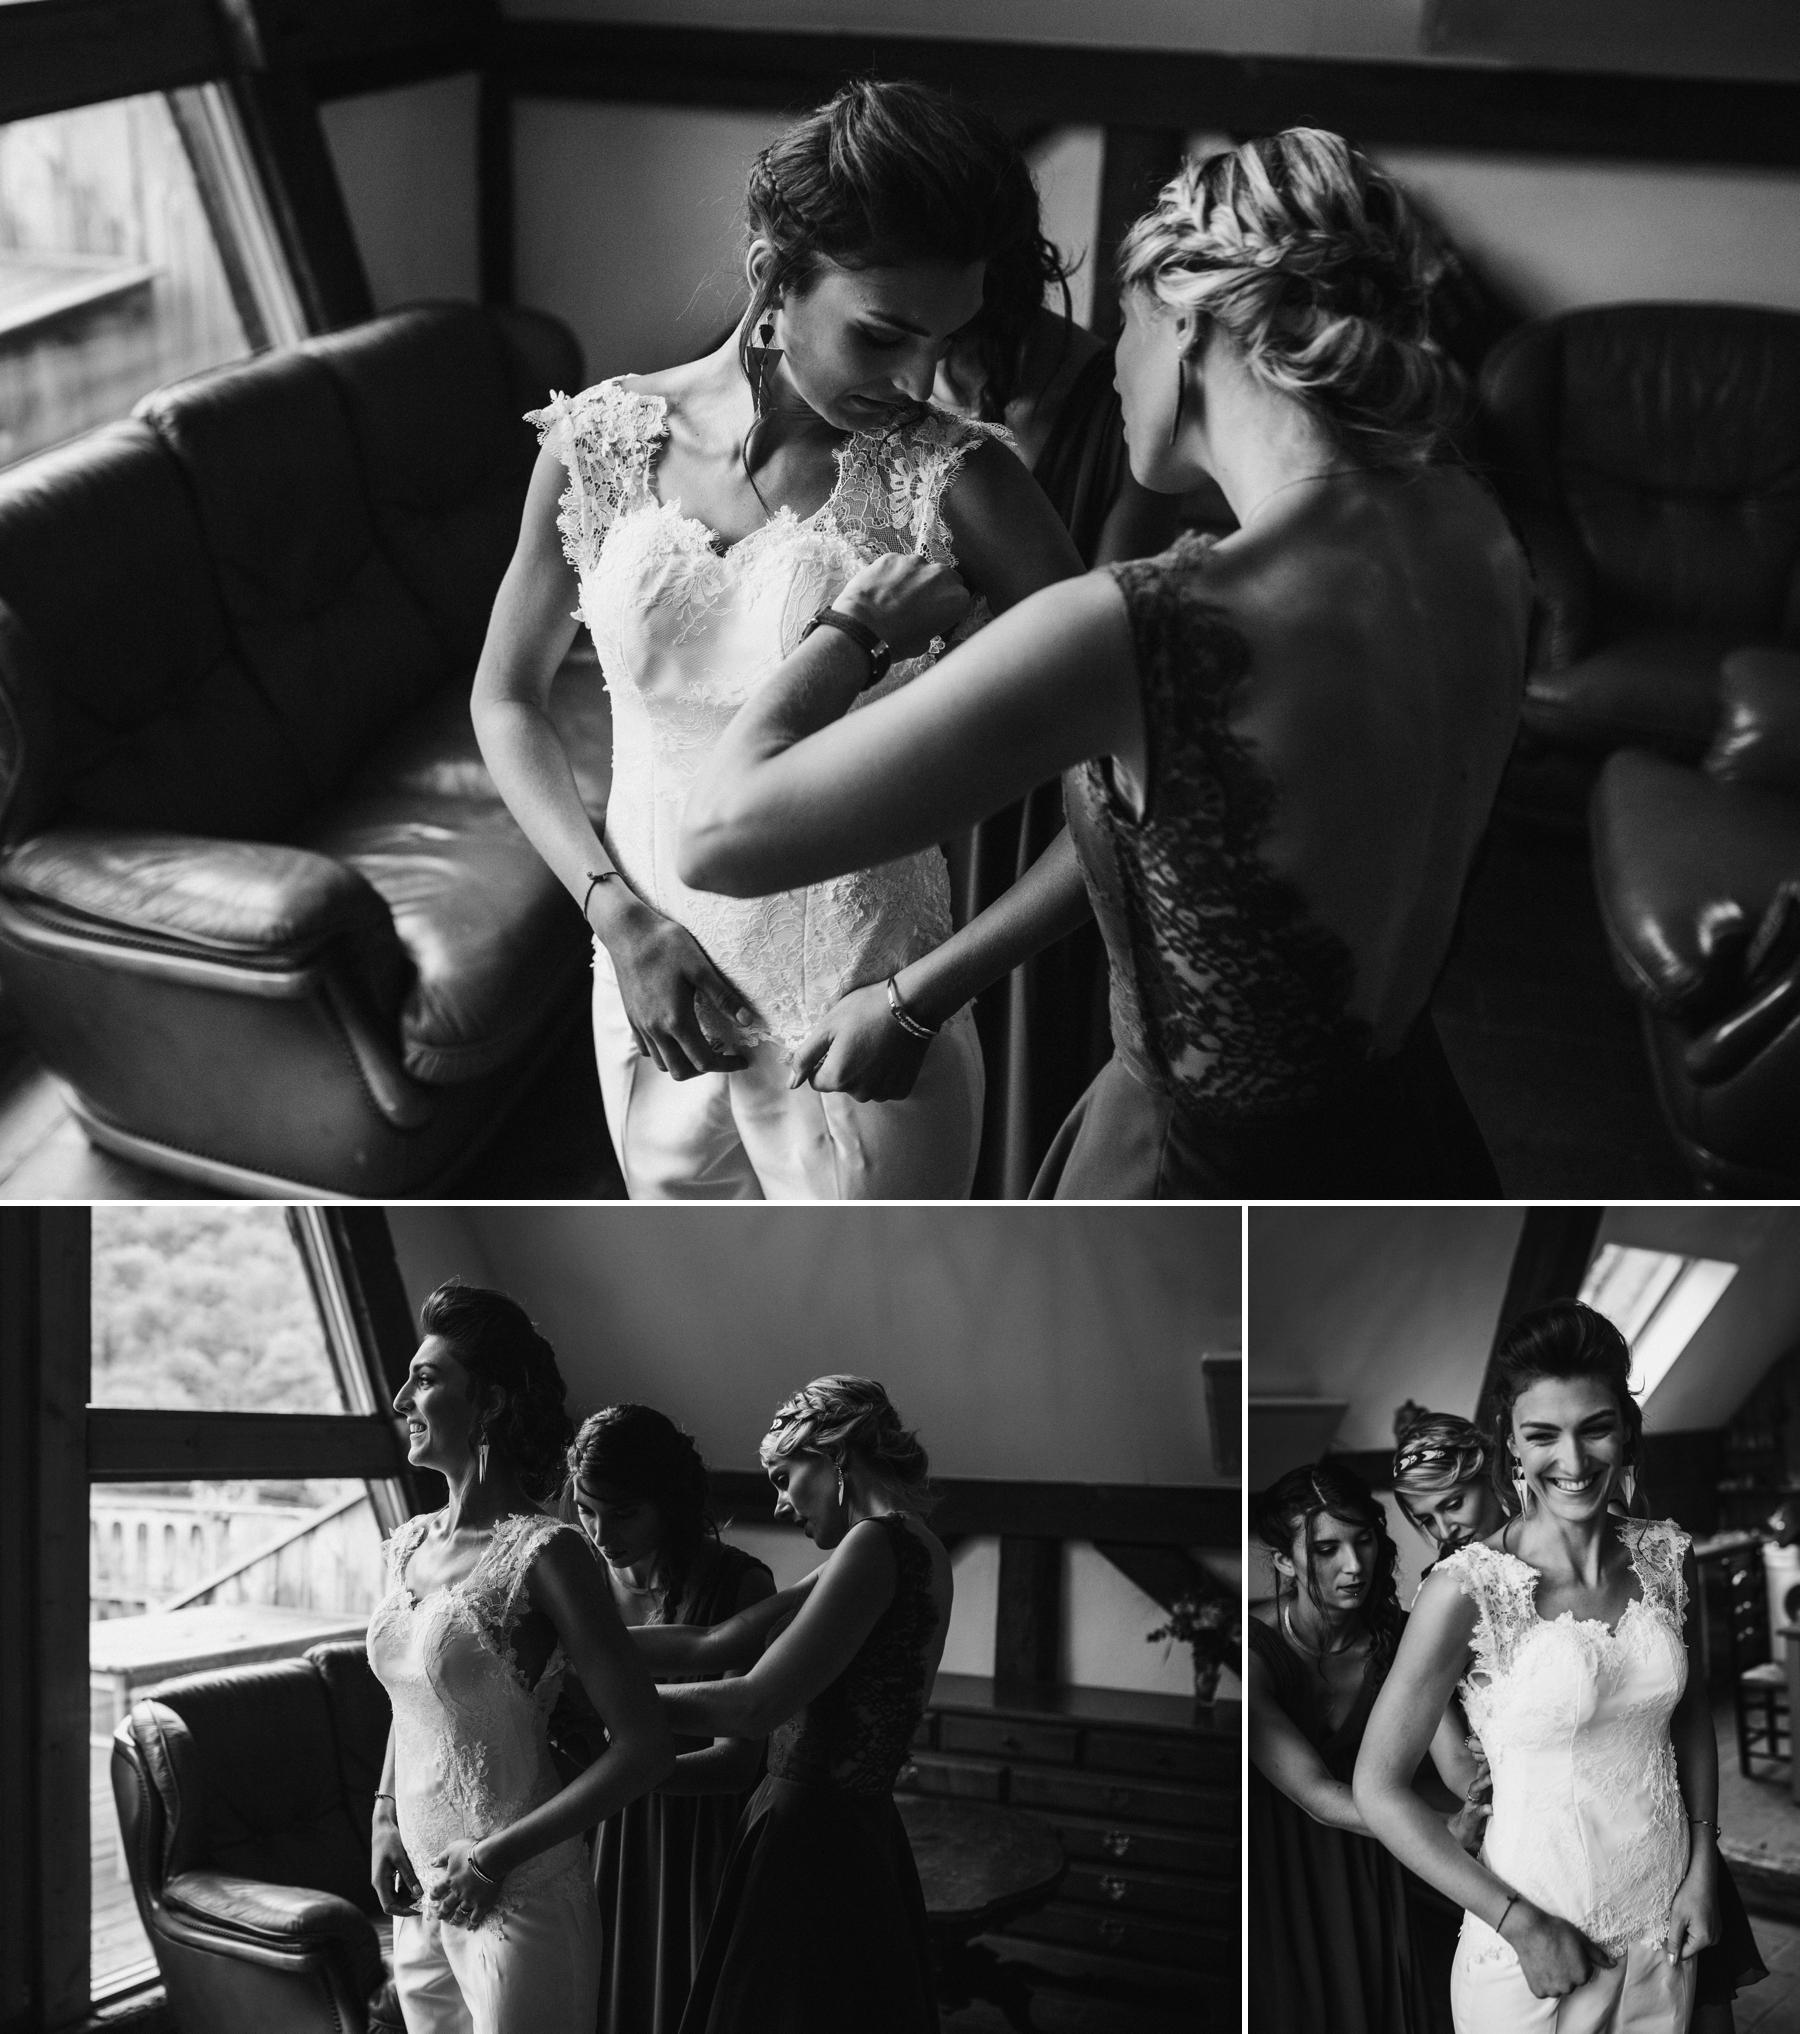 mariage-relais-gensbourg-raphaelmelka-02.jpg